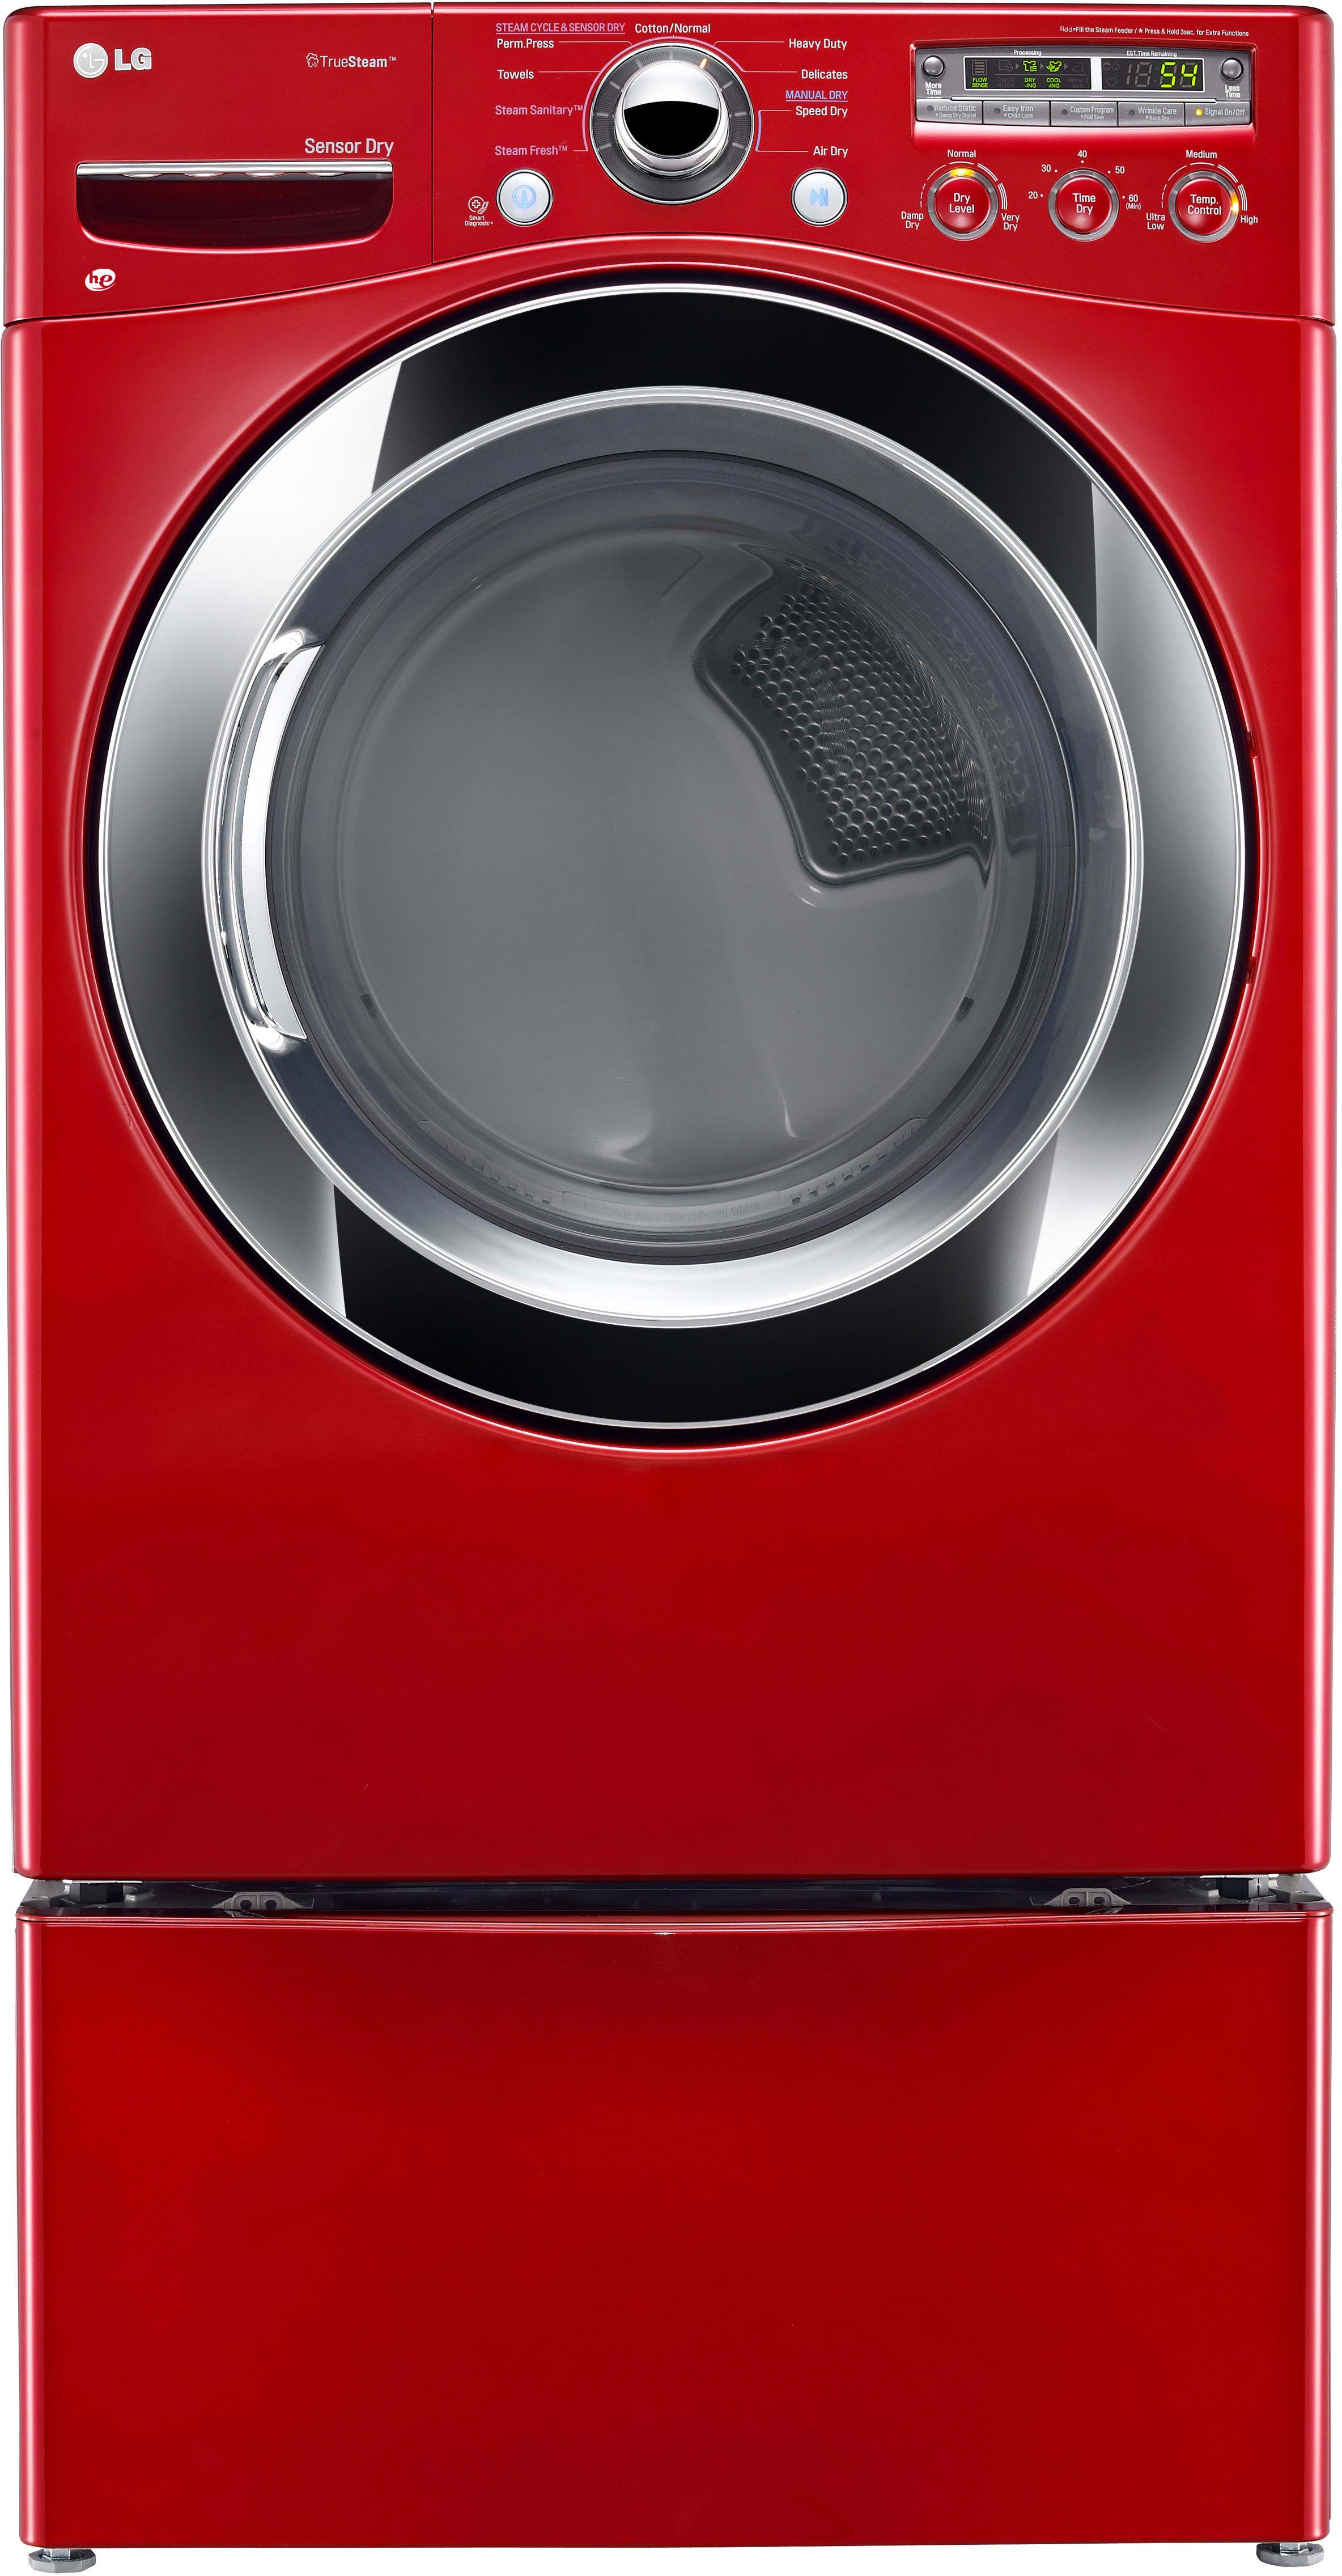 photo pedestal electrolux x of washer